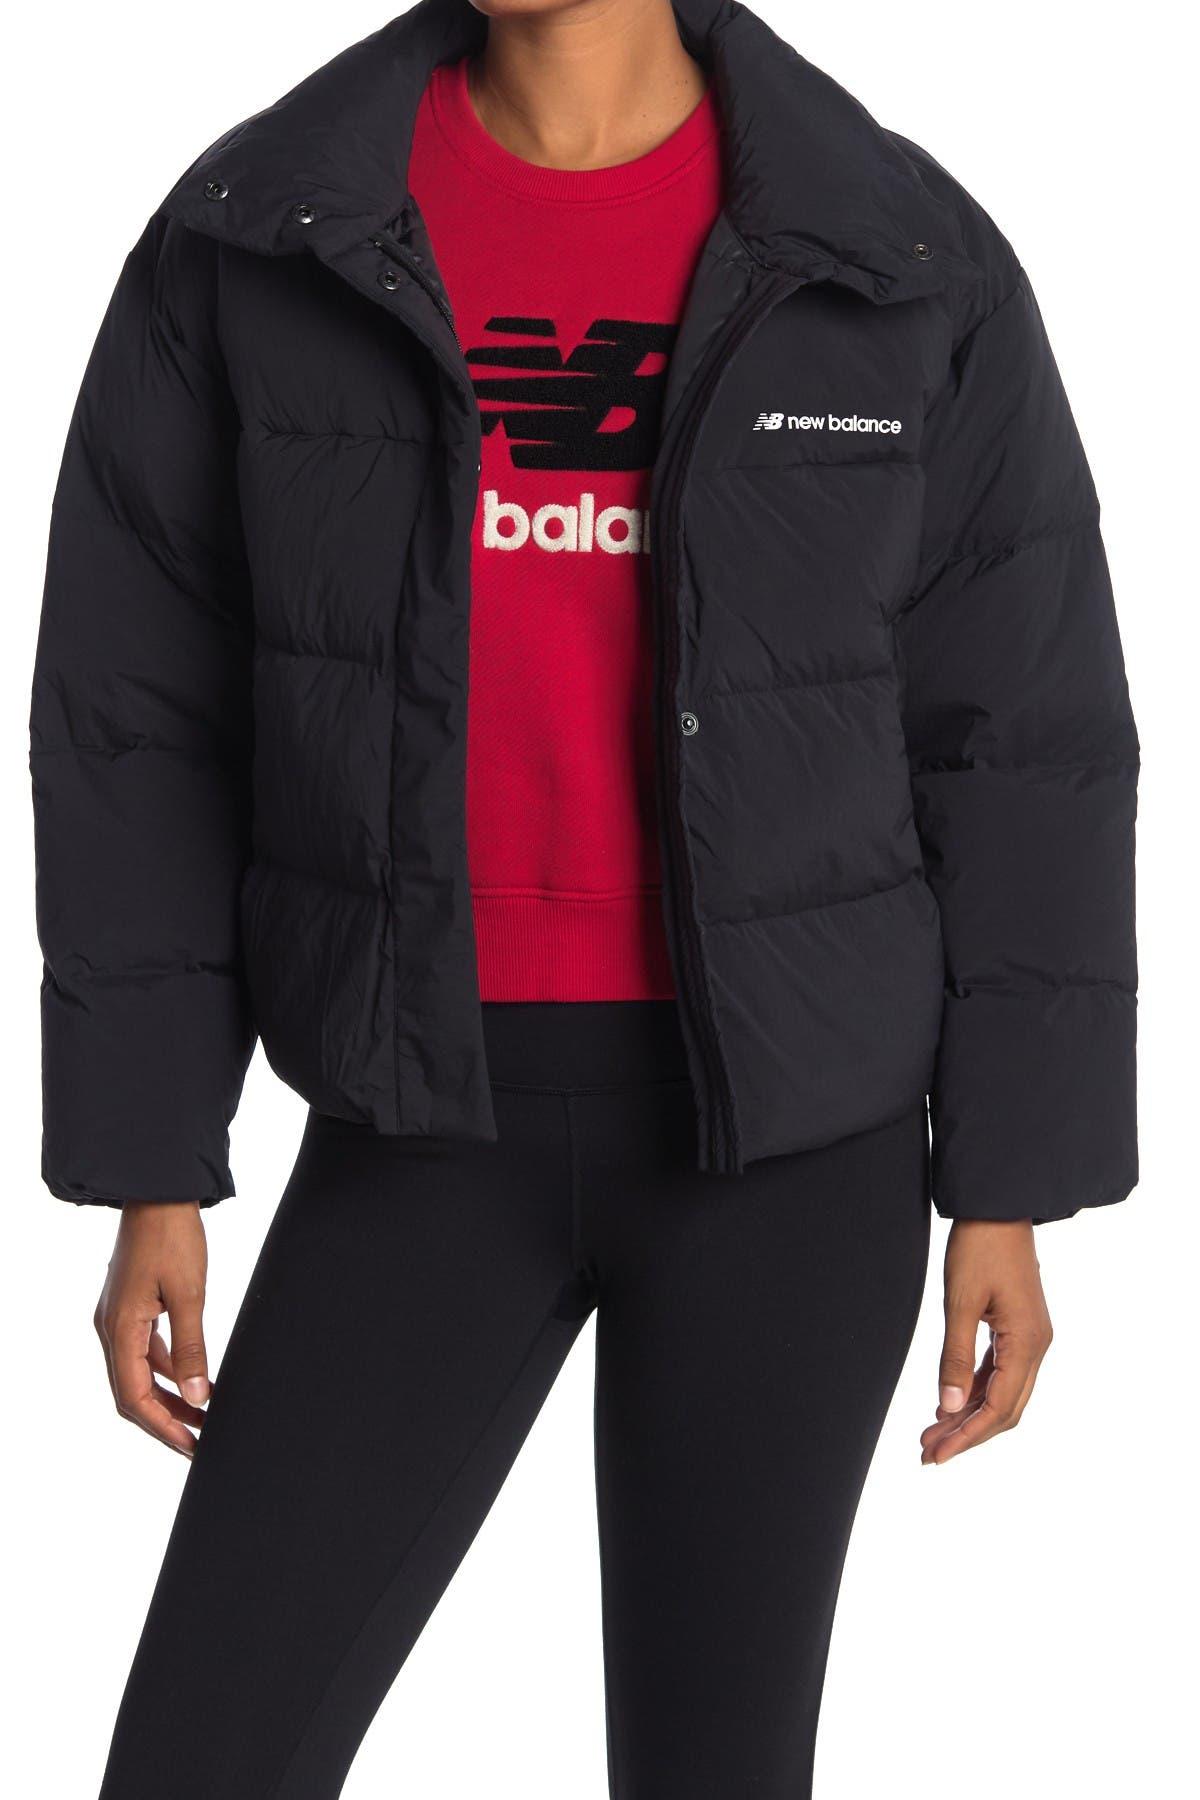 Image of New Balance Select Cropped Heat Down Jacket